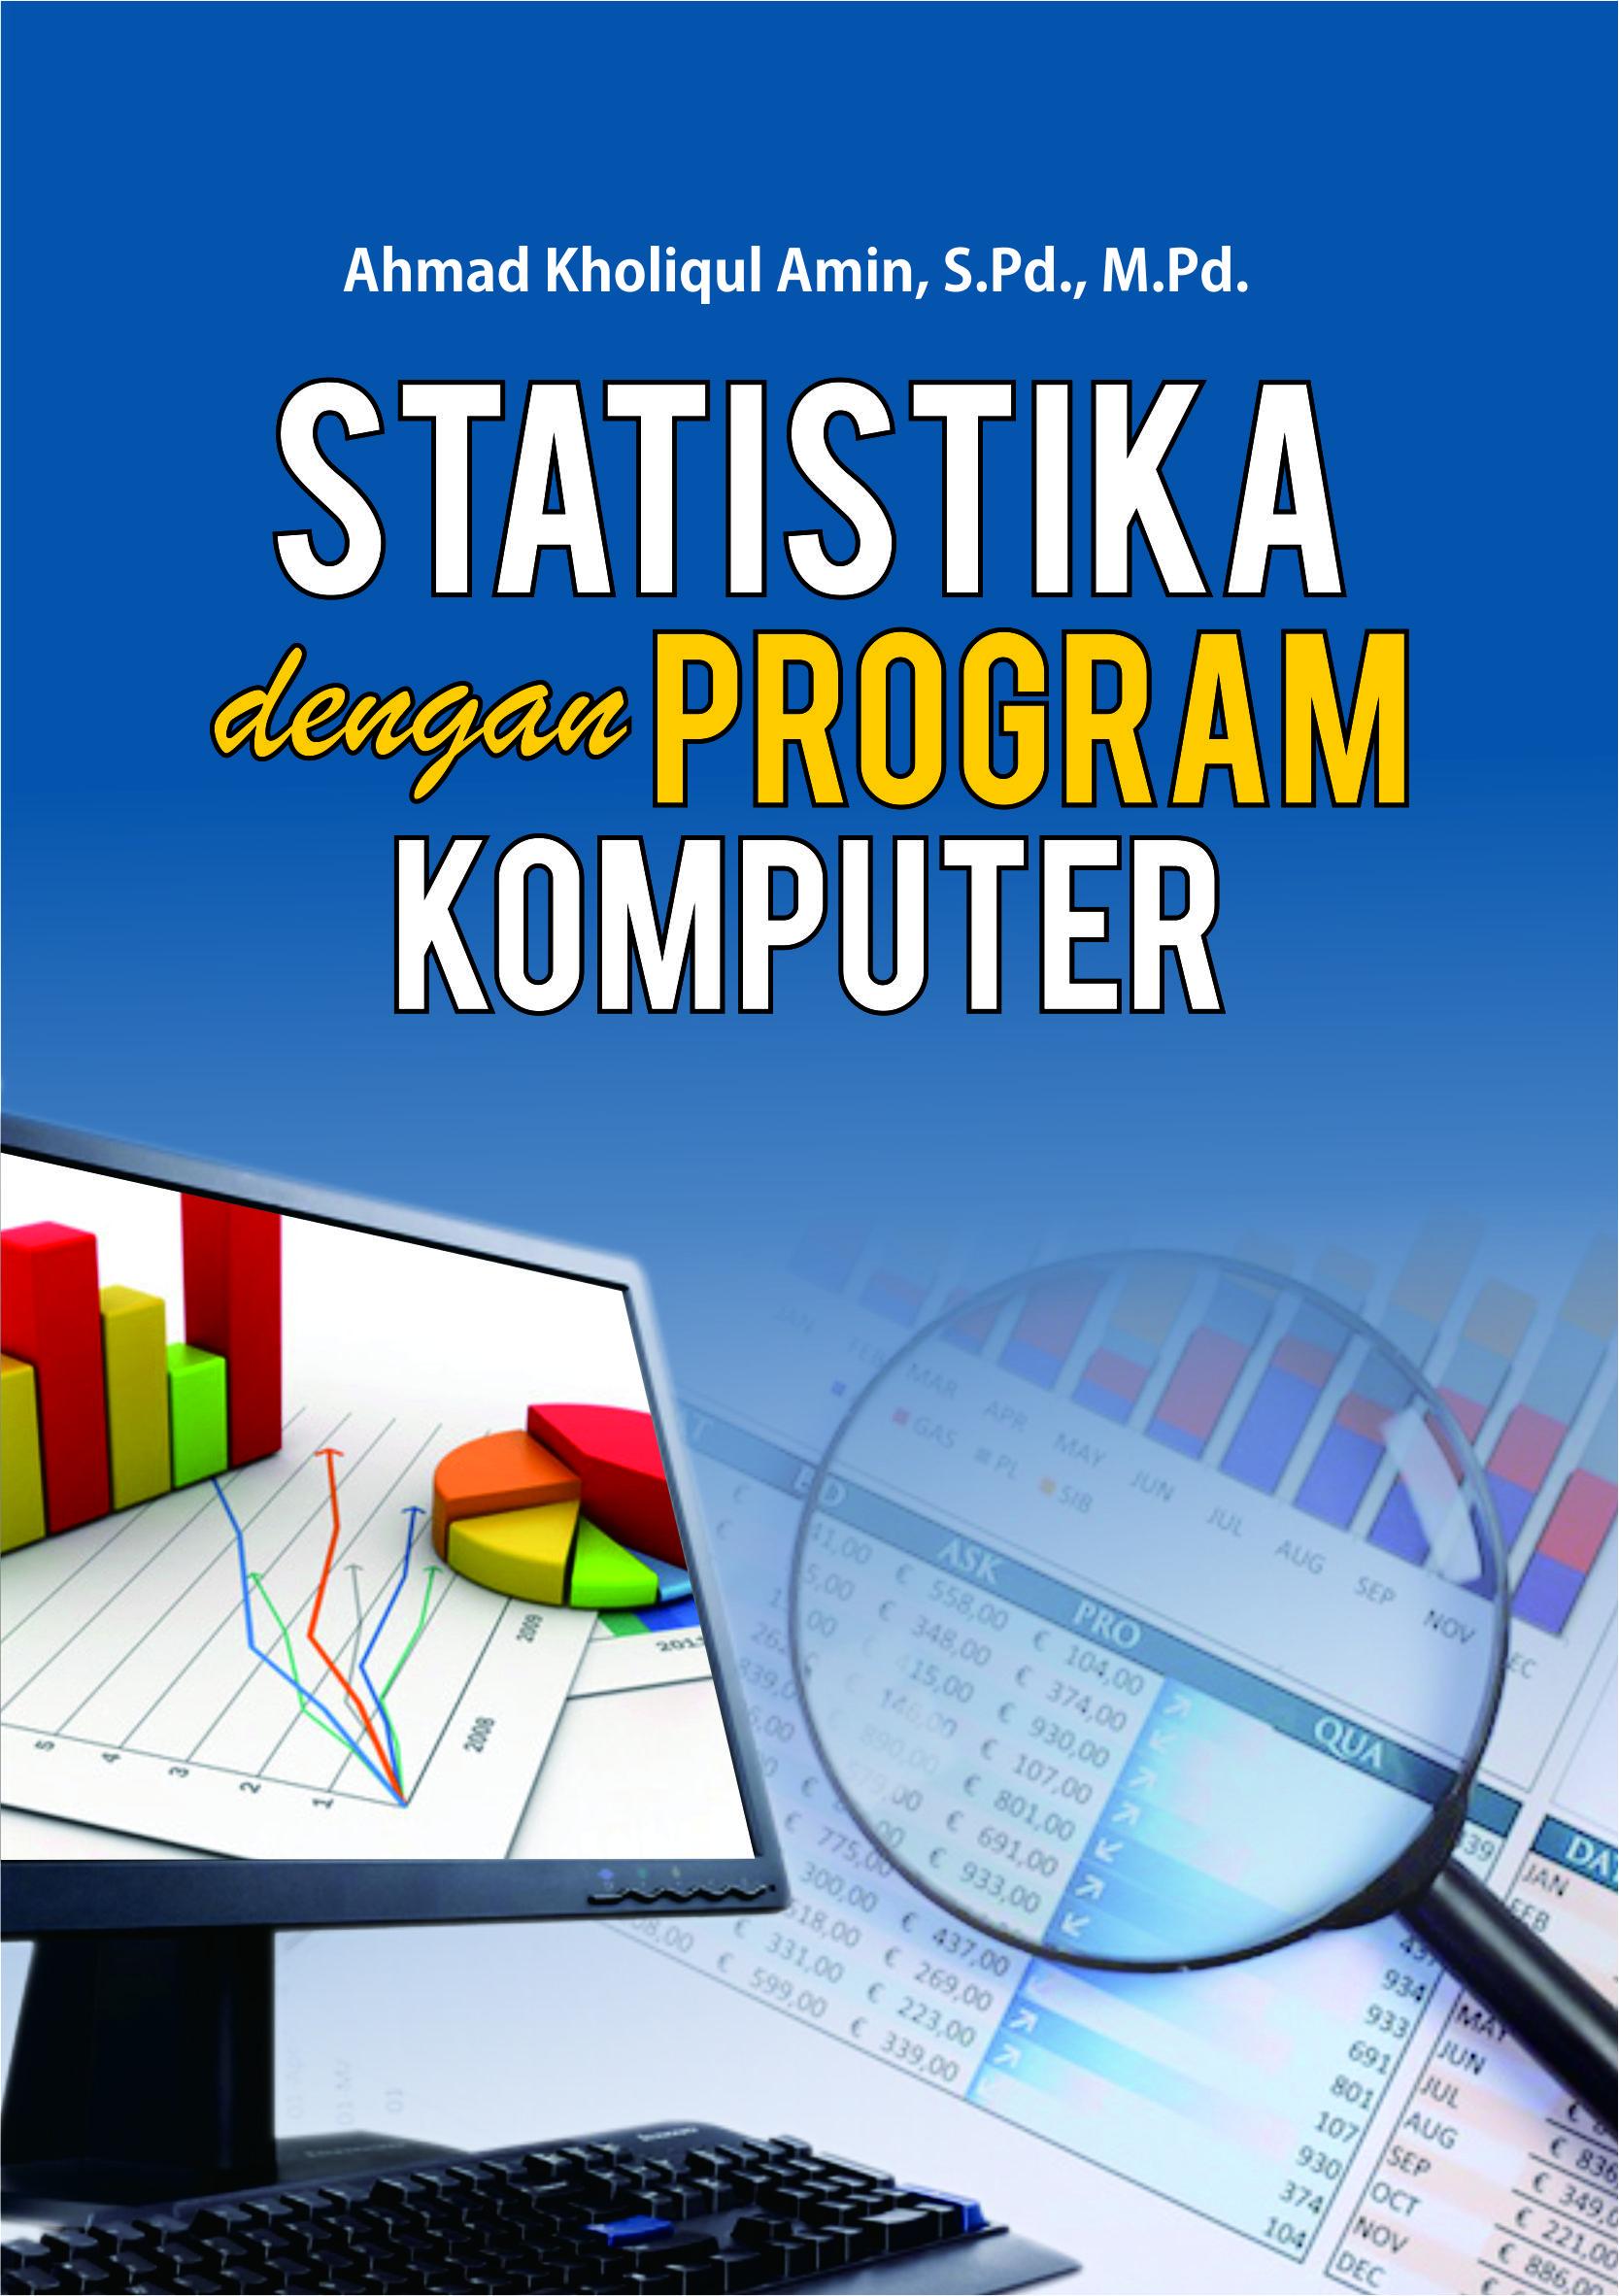 Statistika dengan program komputer [sumber elektronis]